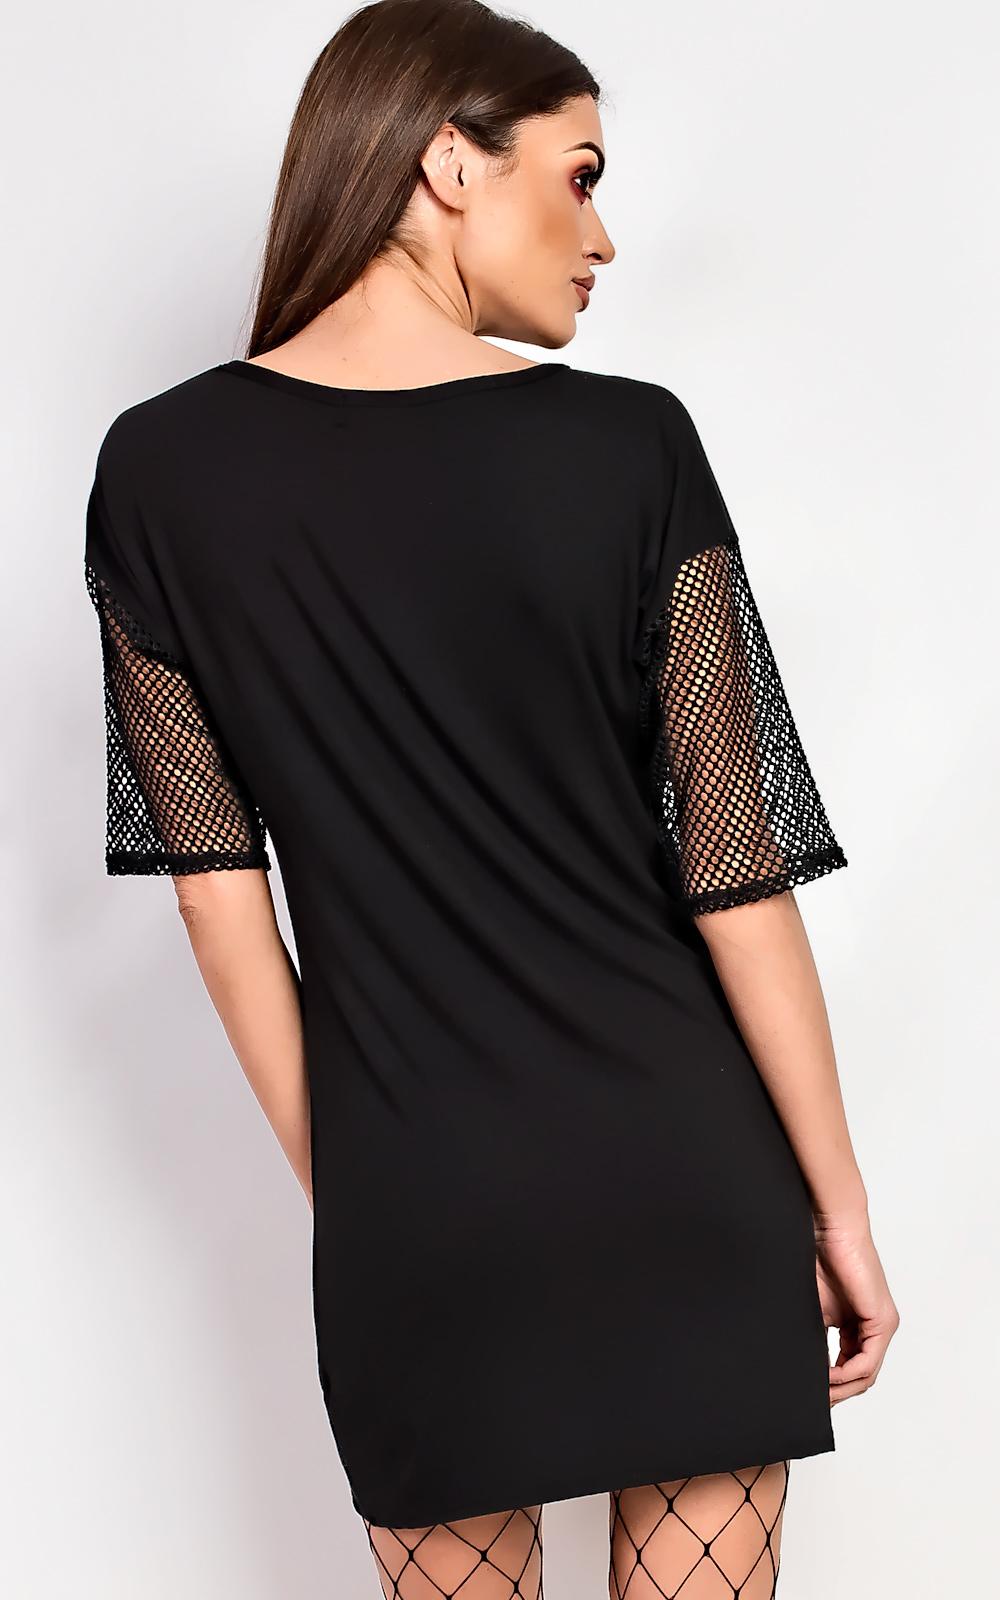 Black t shirt dress ebay - Ikrush Balay Net Detail T Shirt Dress